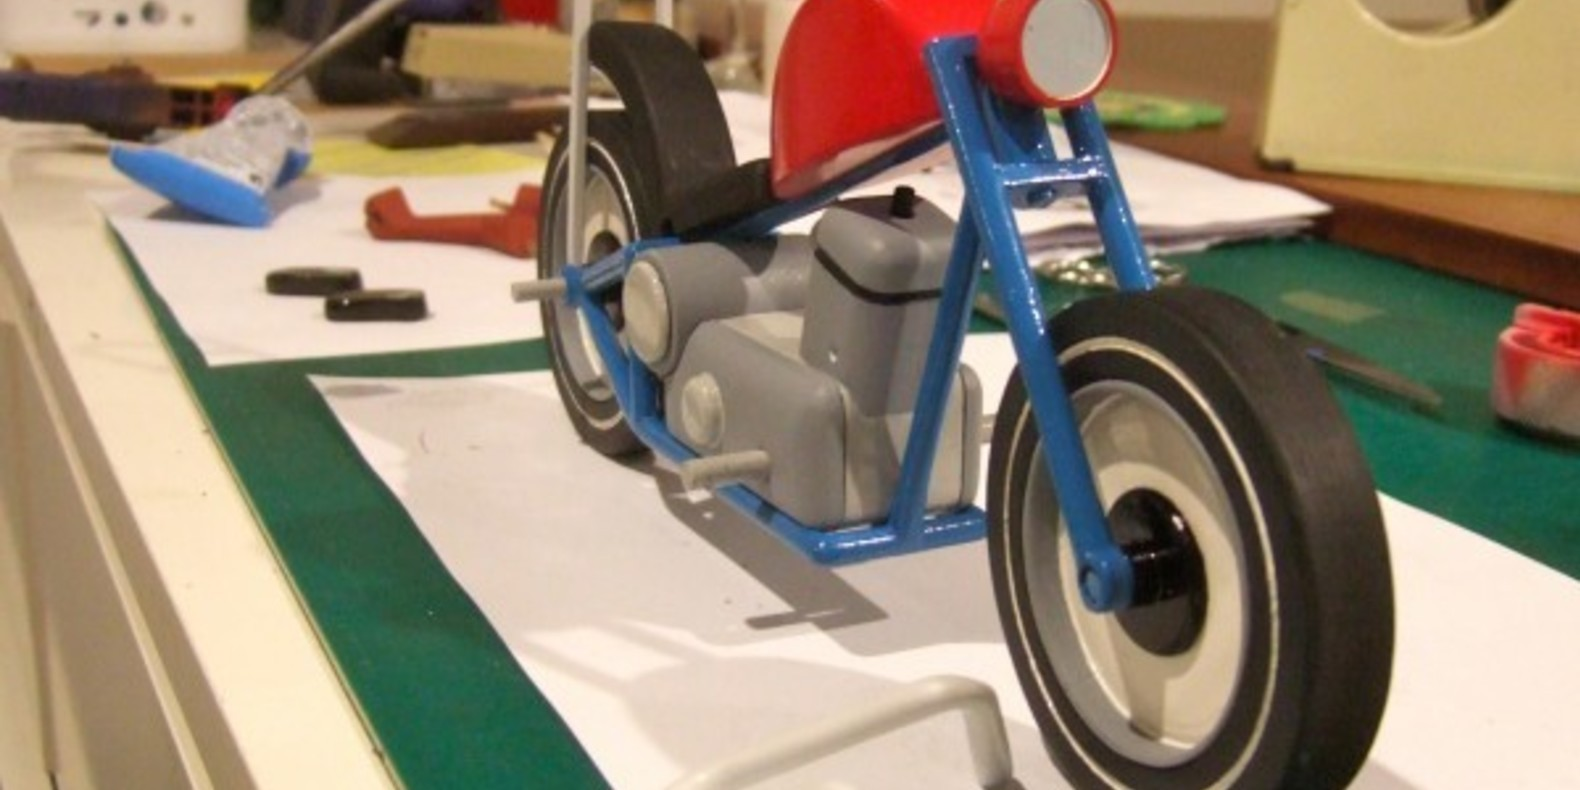 russell tate stay true motorcycle bike biker cults fichier 3D modèle 3D STL 3D printing 4